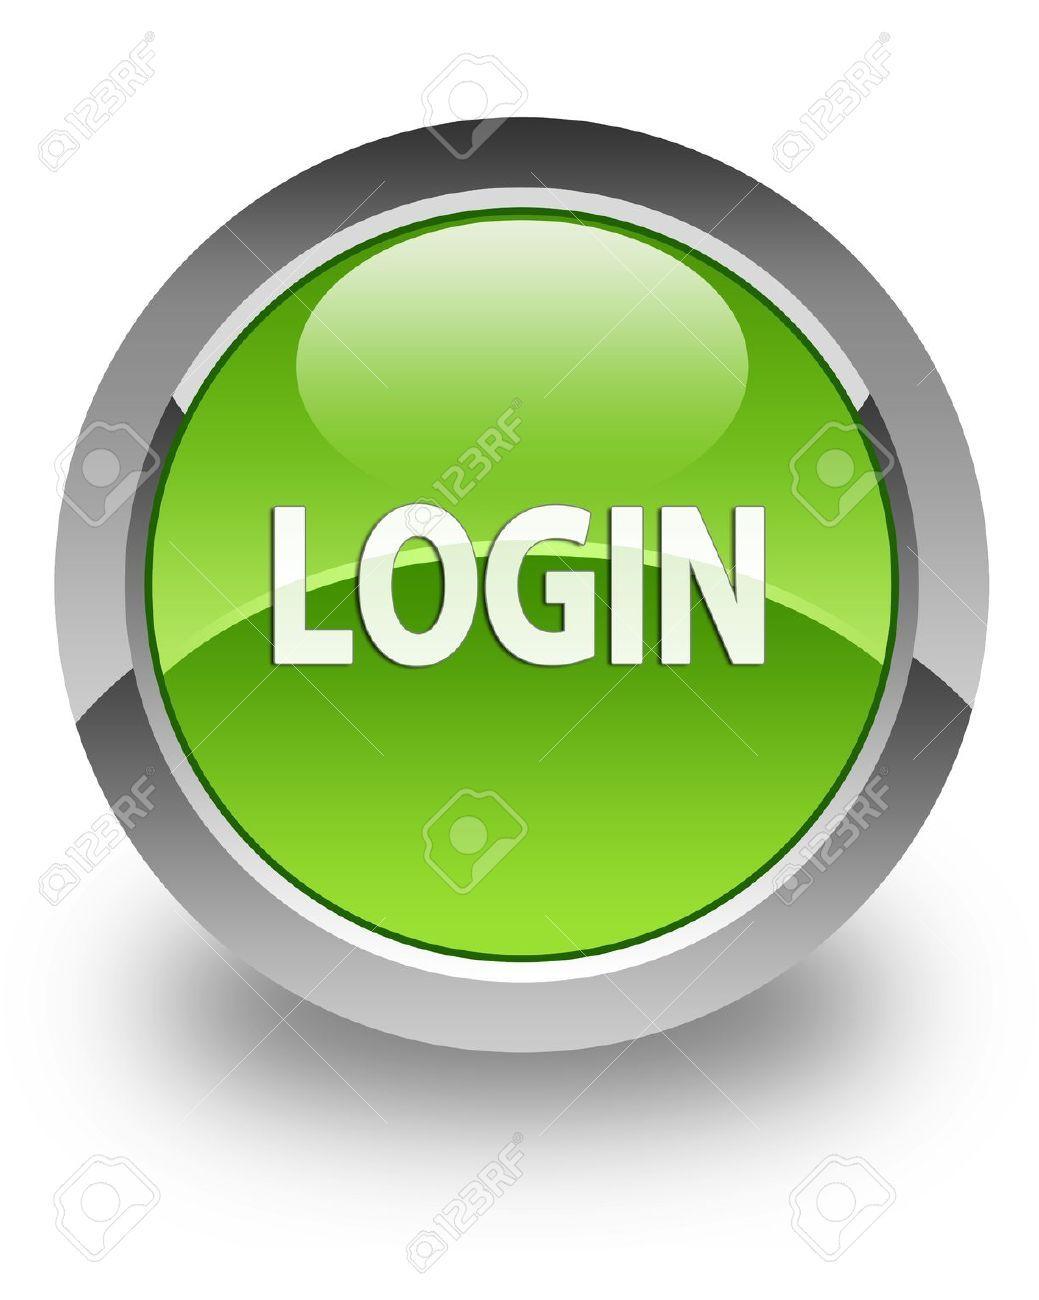 13956097-Login-icon-on-glossy-green-round-button-Stock-Photo.jpg (1039×1300)